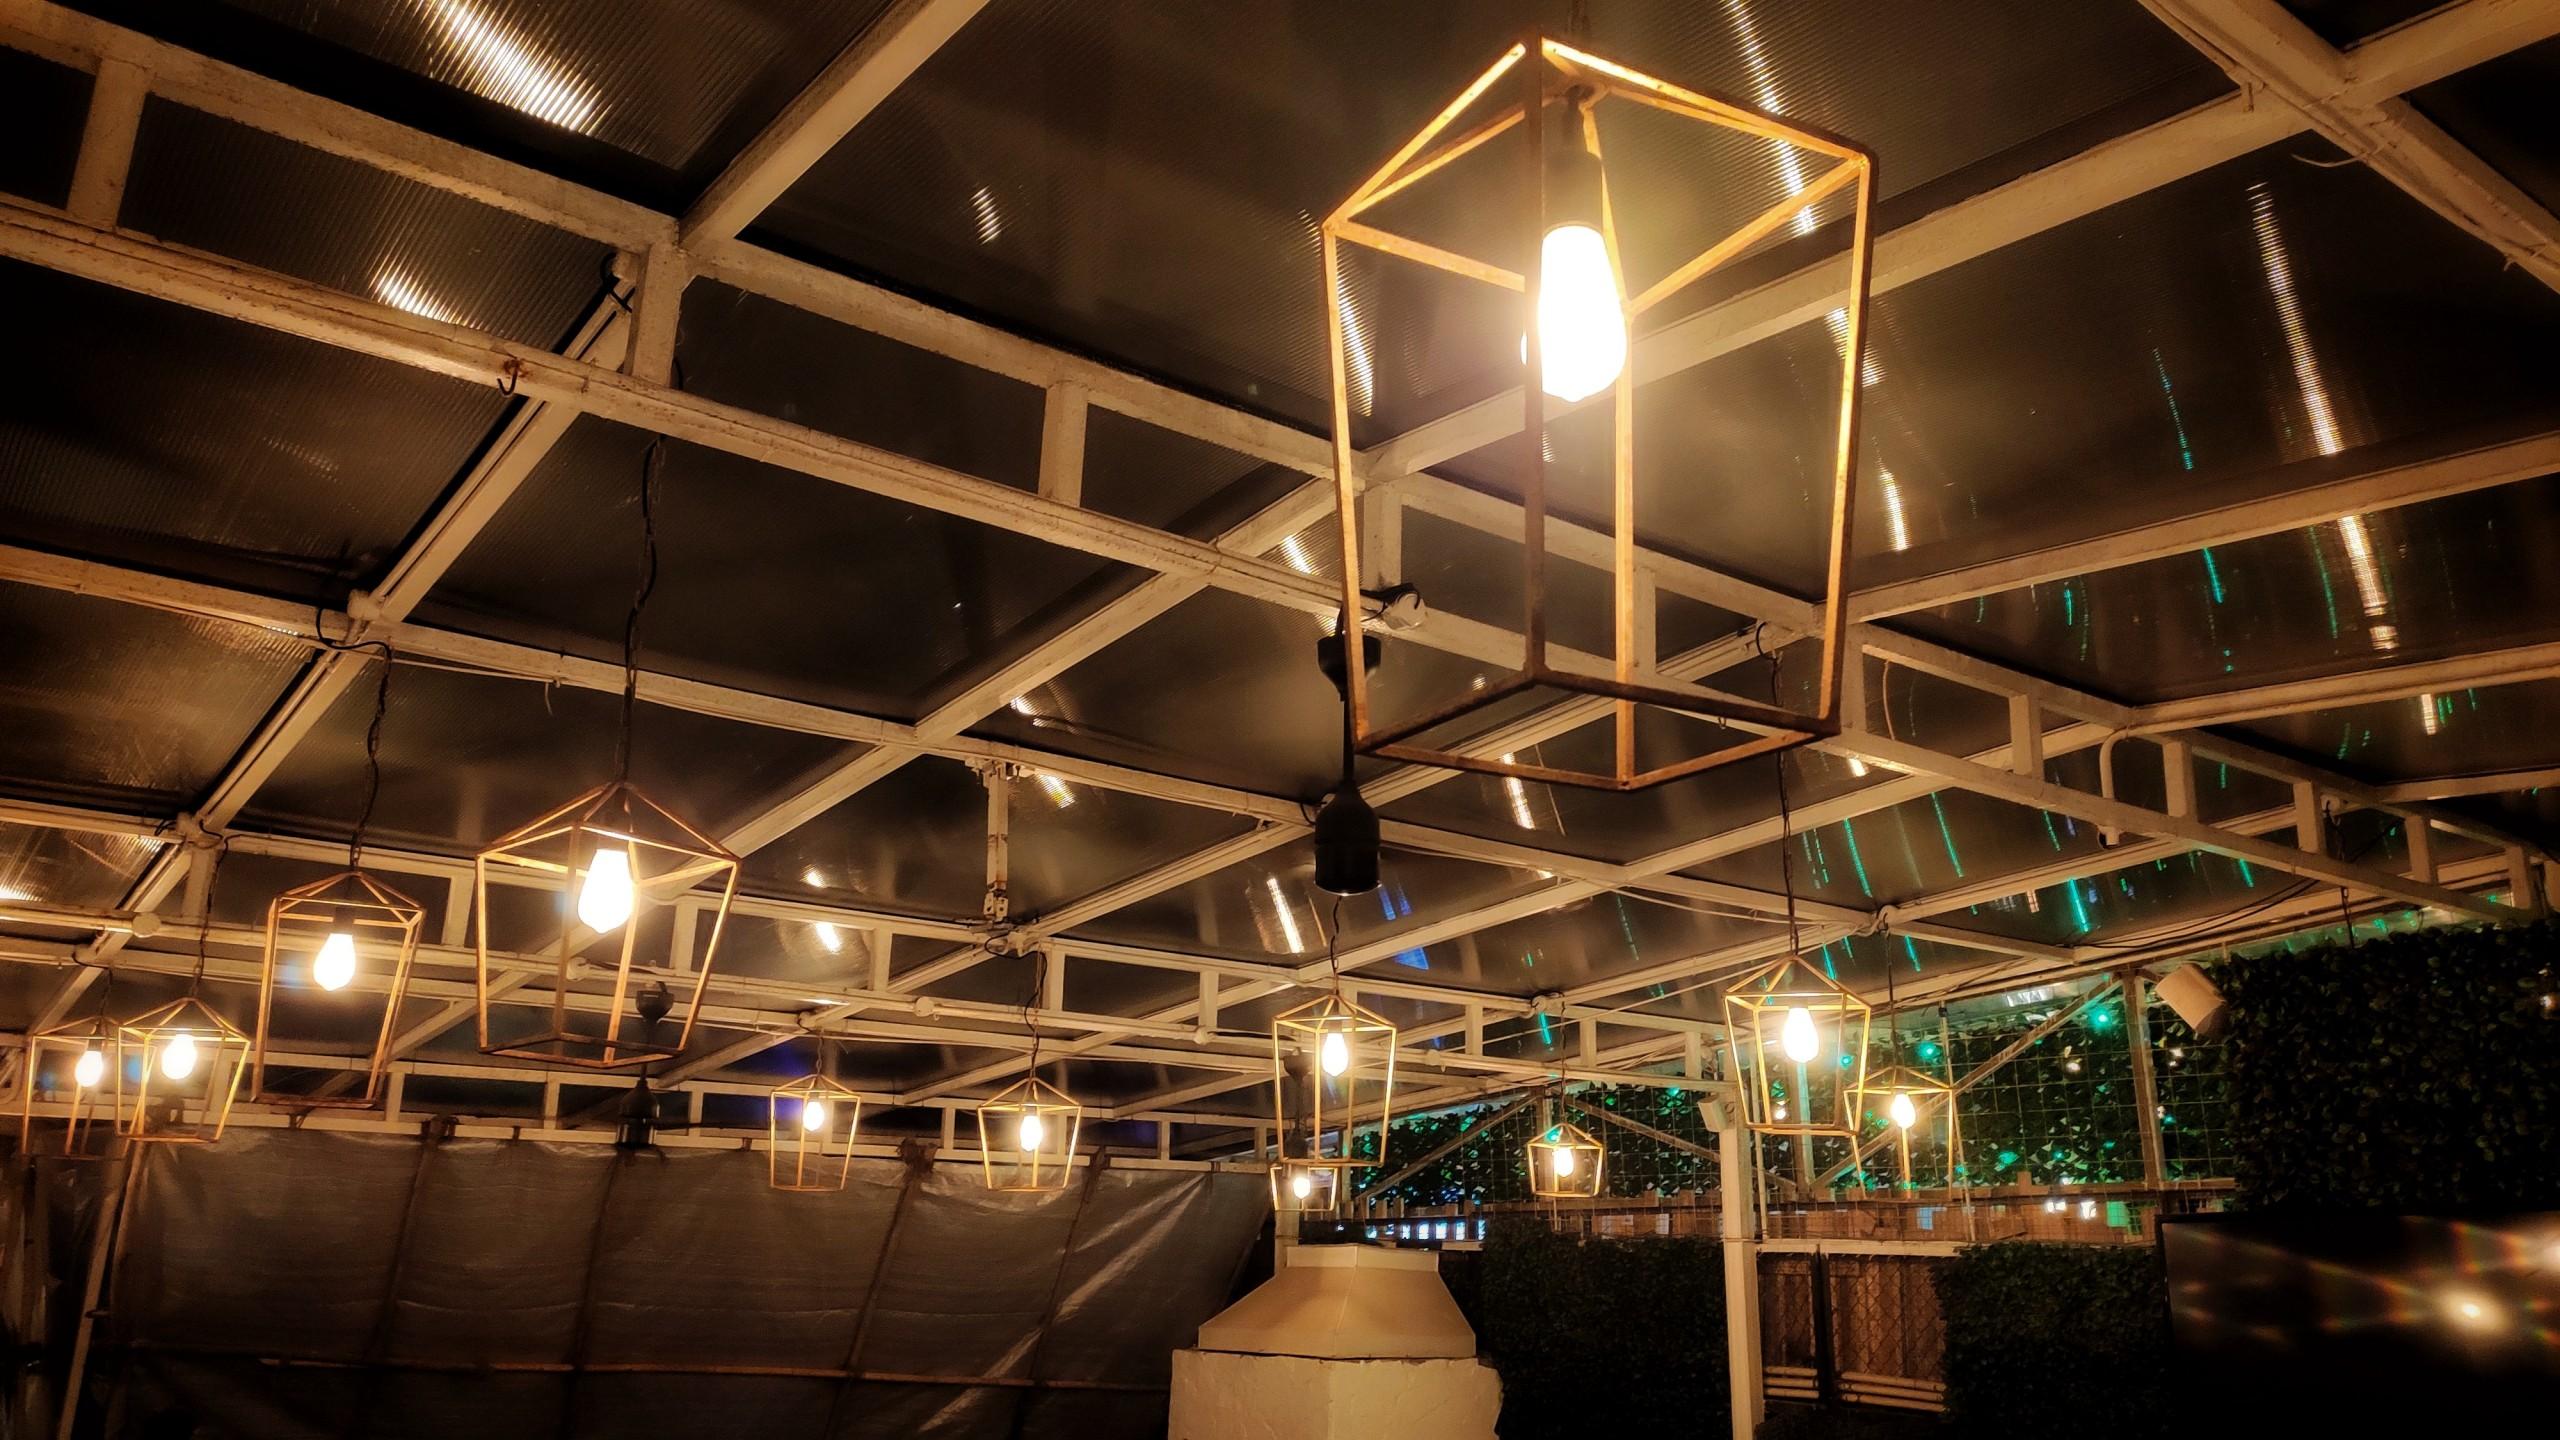 Interior Decoration Lamps